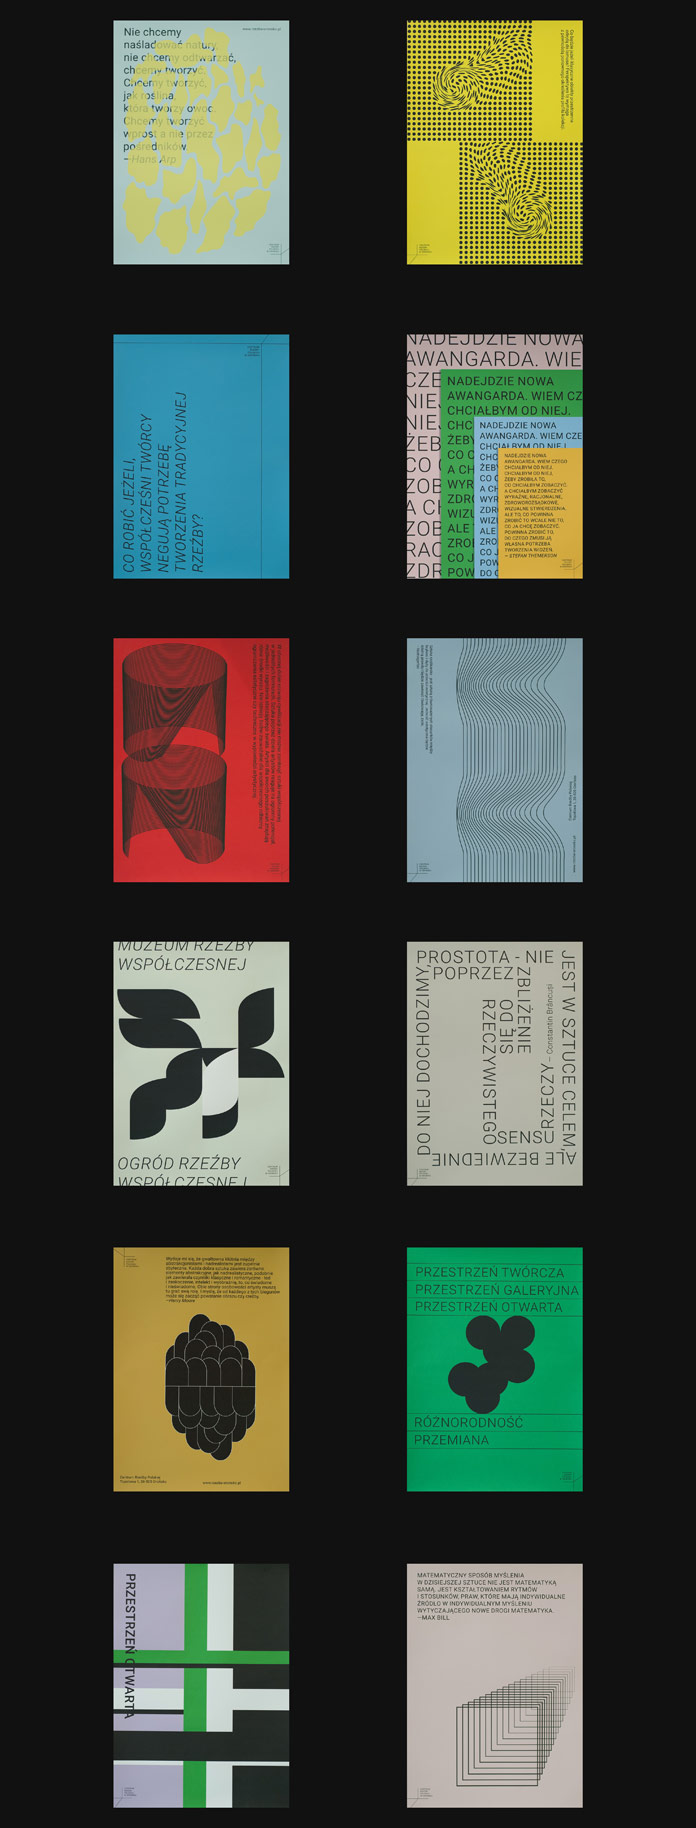 Posters by Marina Lewandowska for Centre of Polish Sculpture.